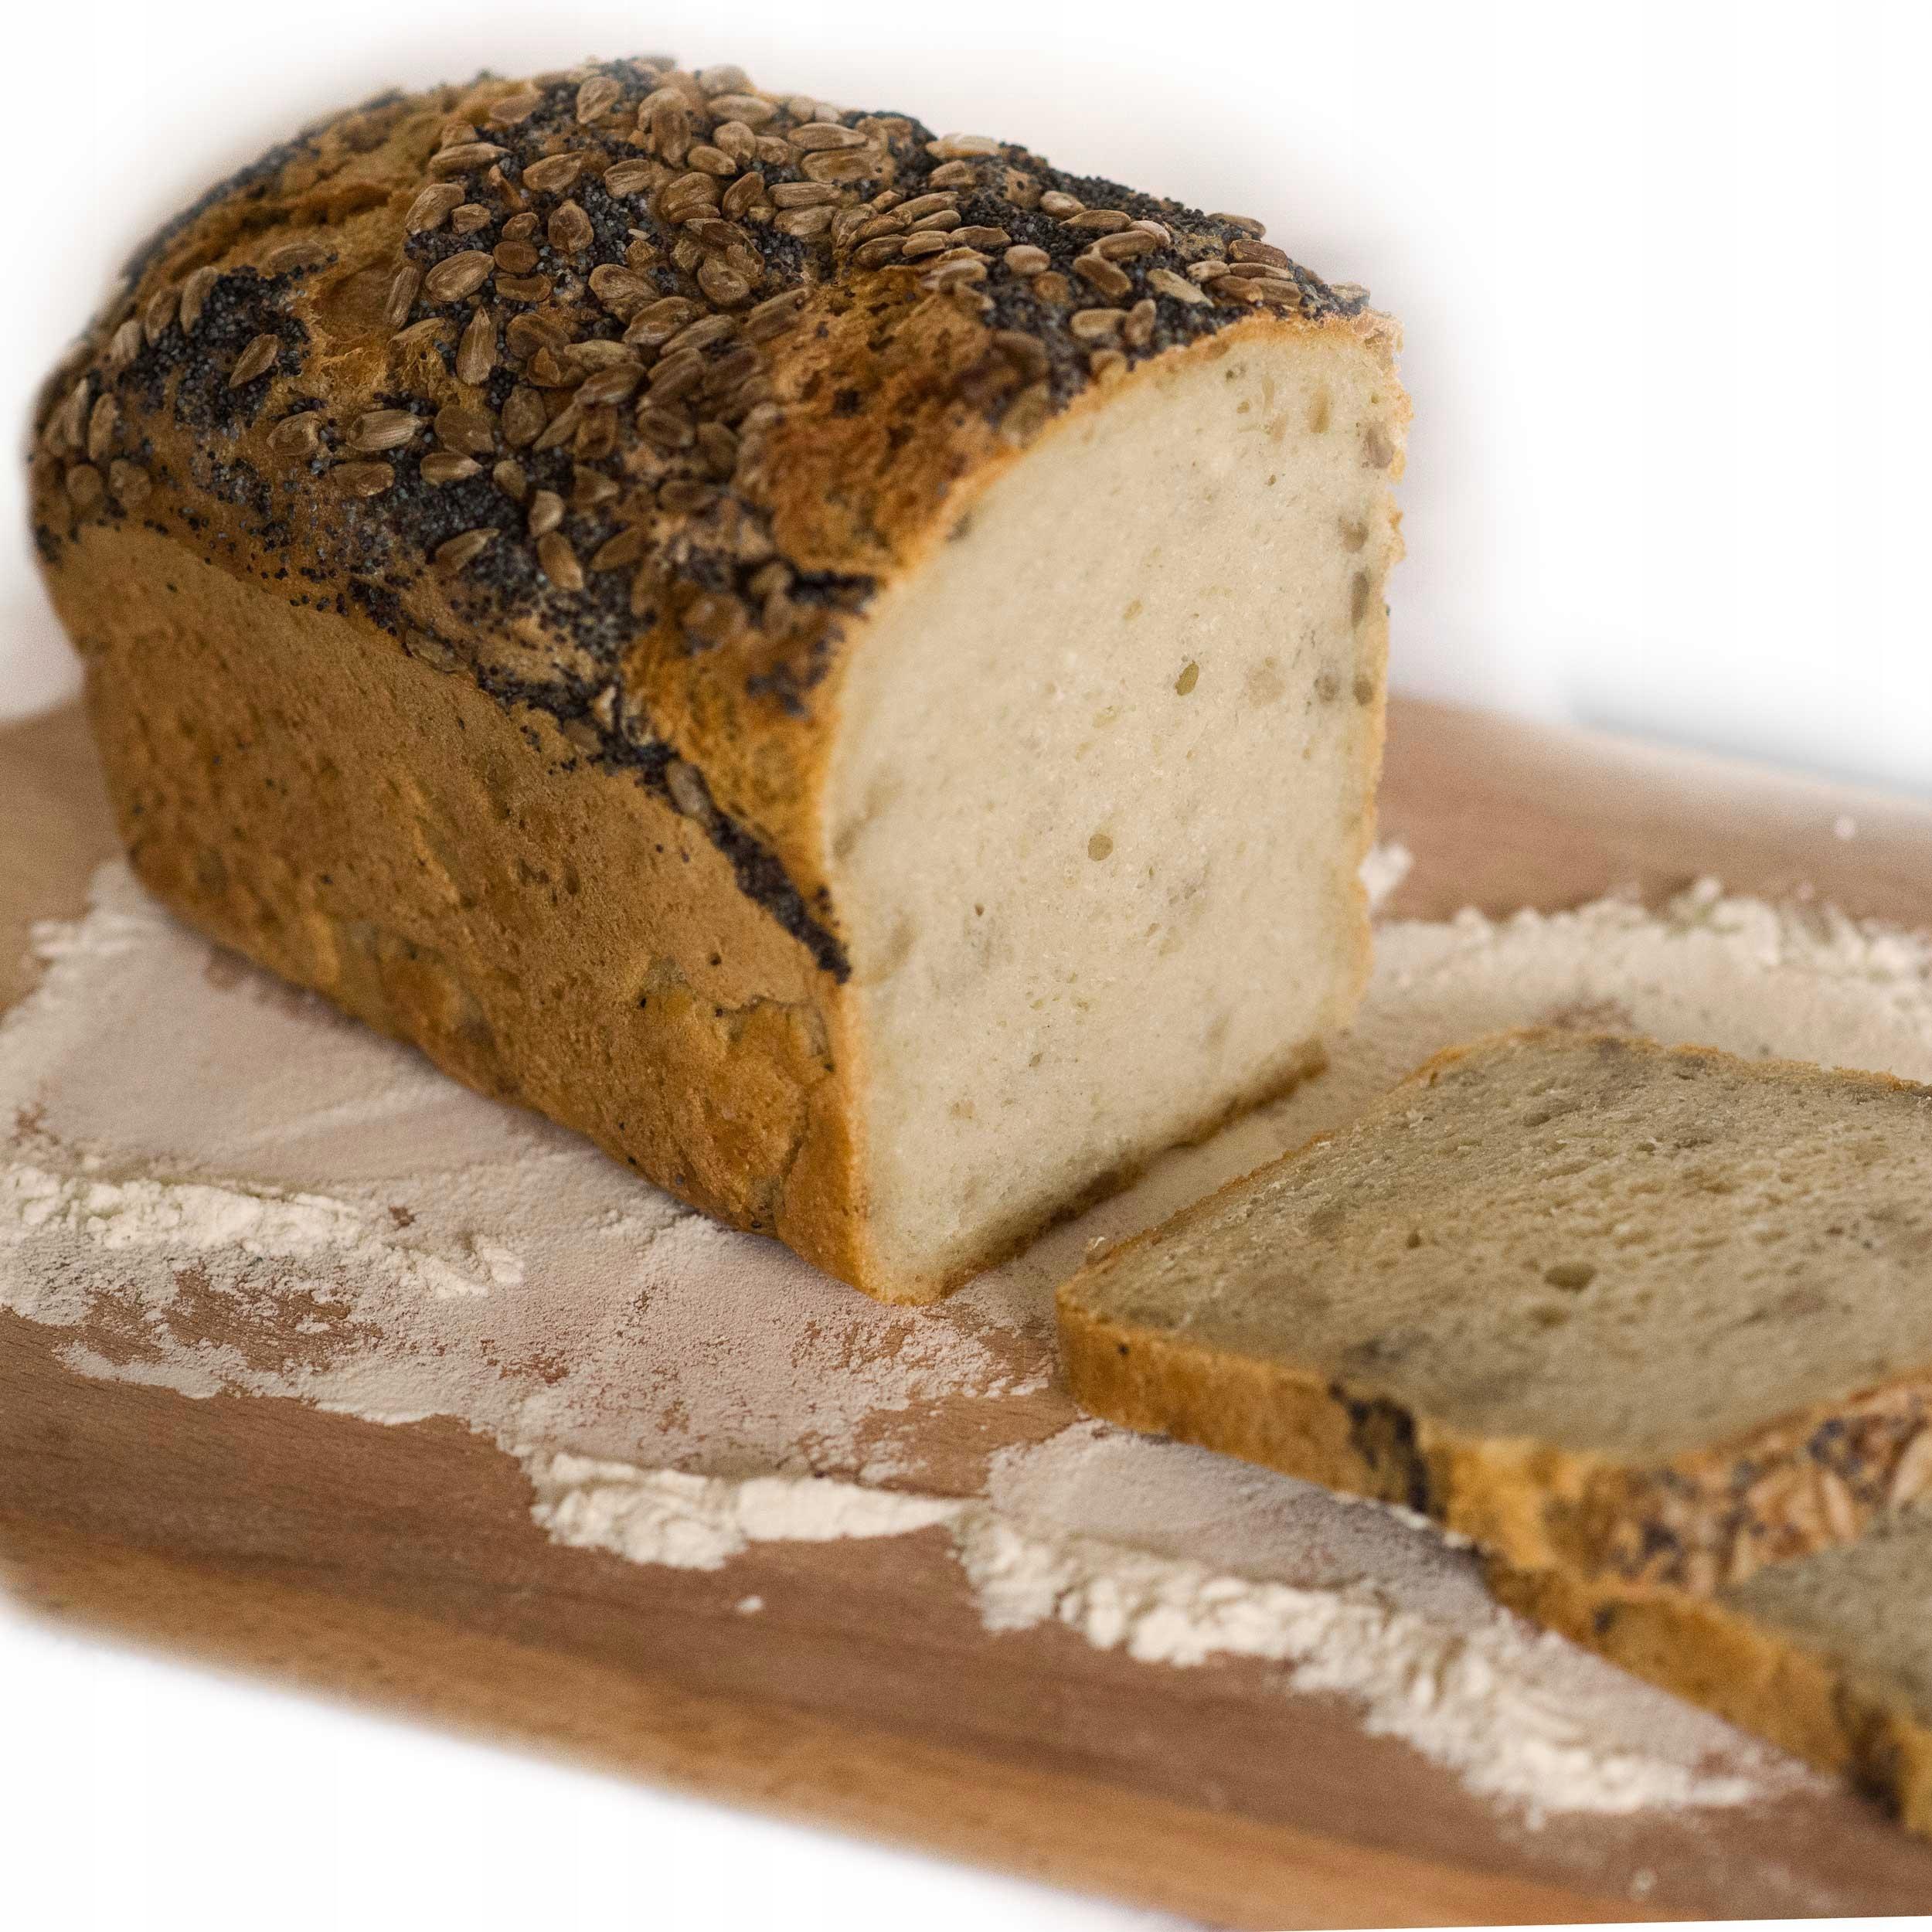 Домашний хлеб на закваске по-деревенски